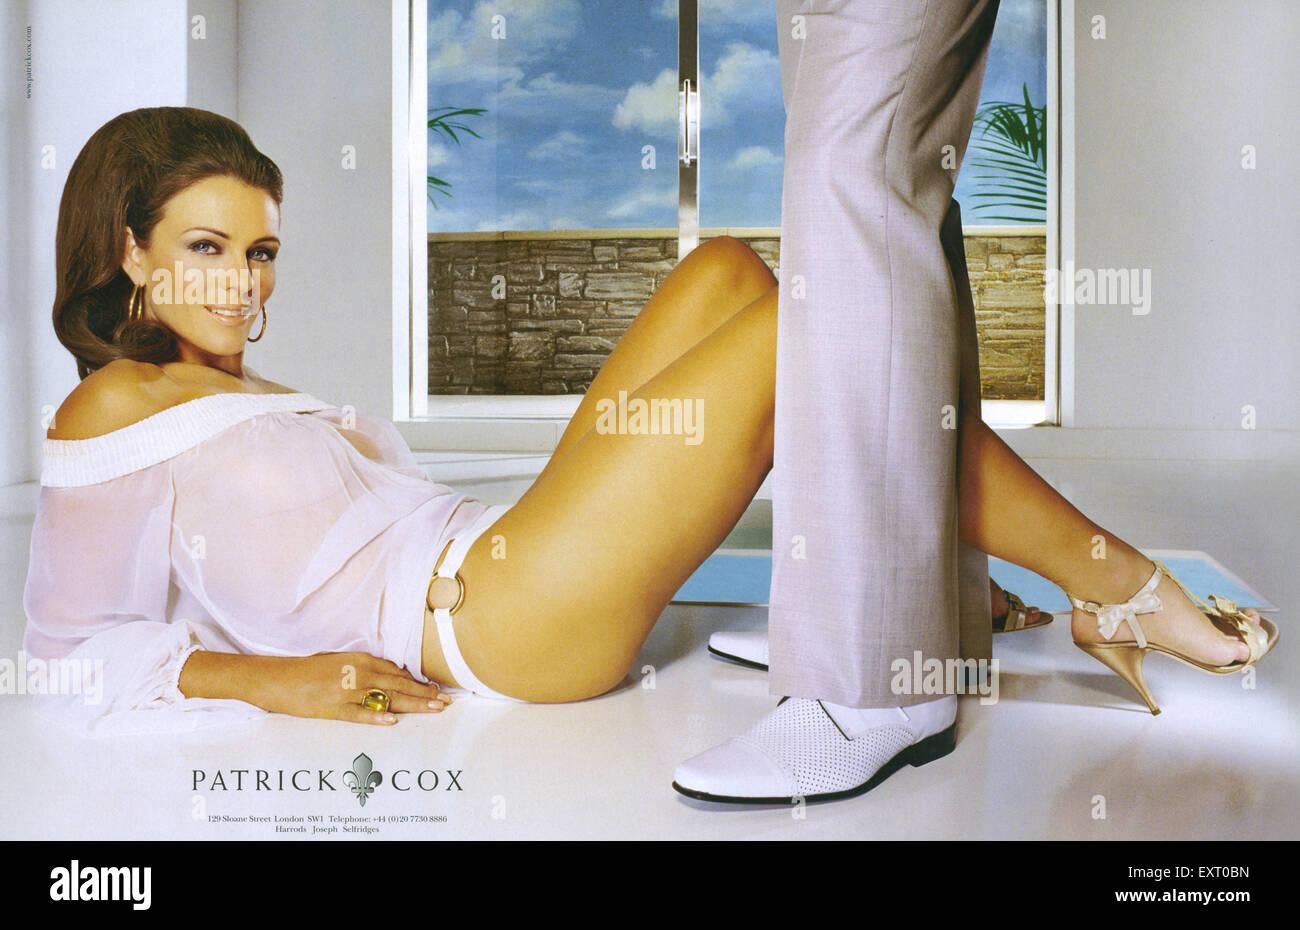 2000er Jahre UK Patrick Cox Magazin Anzeige Stockbild